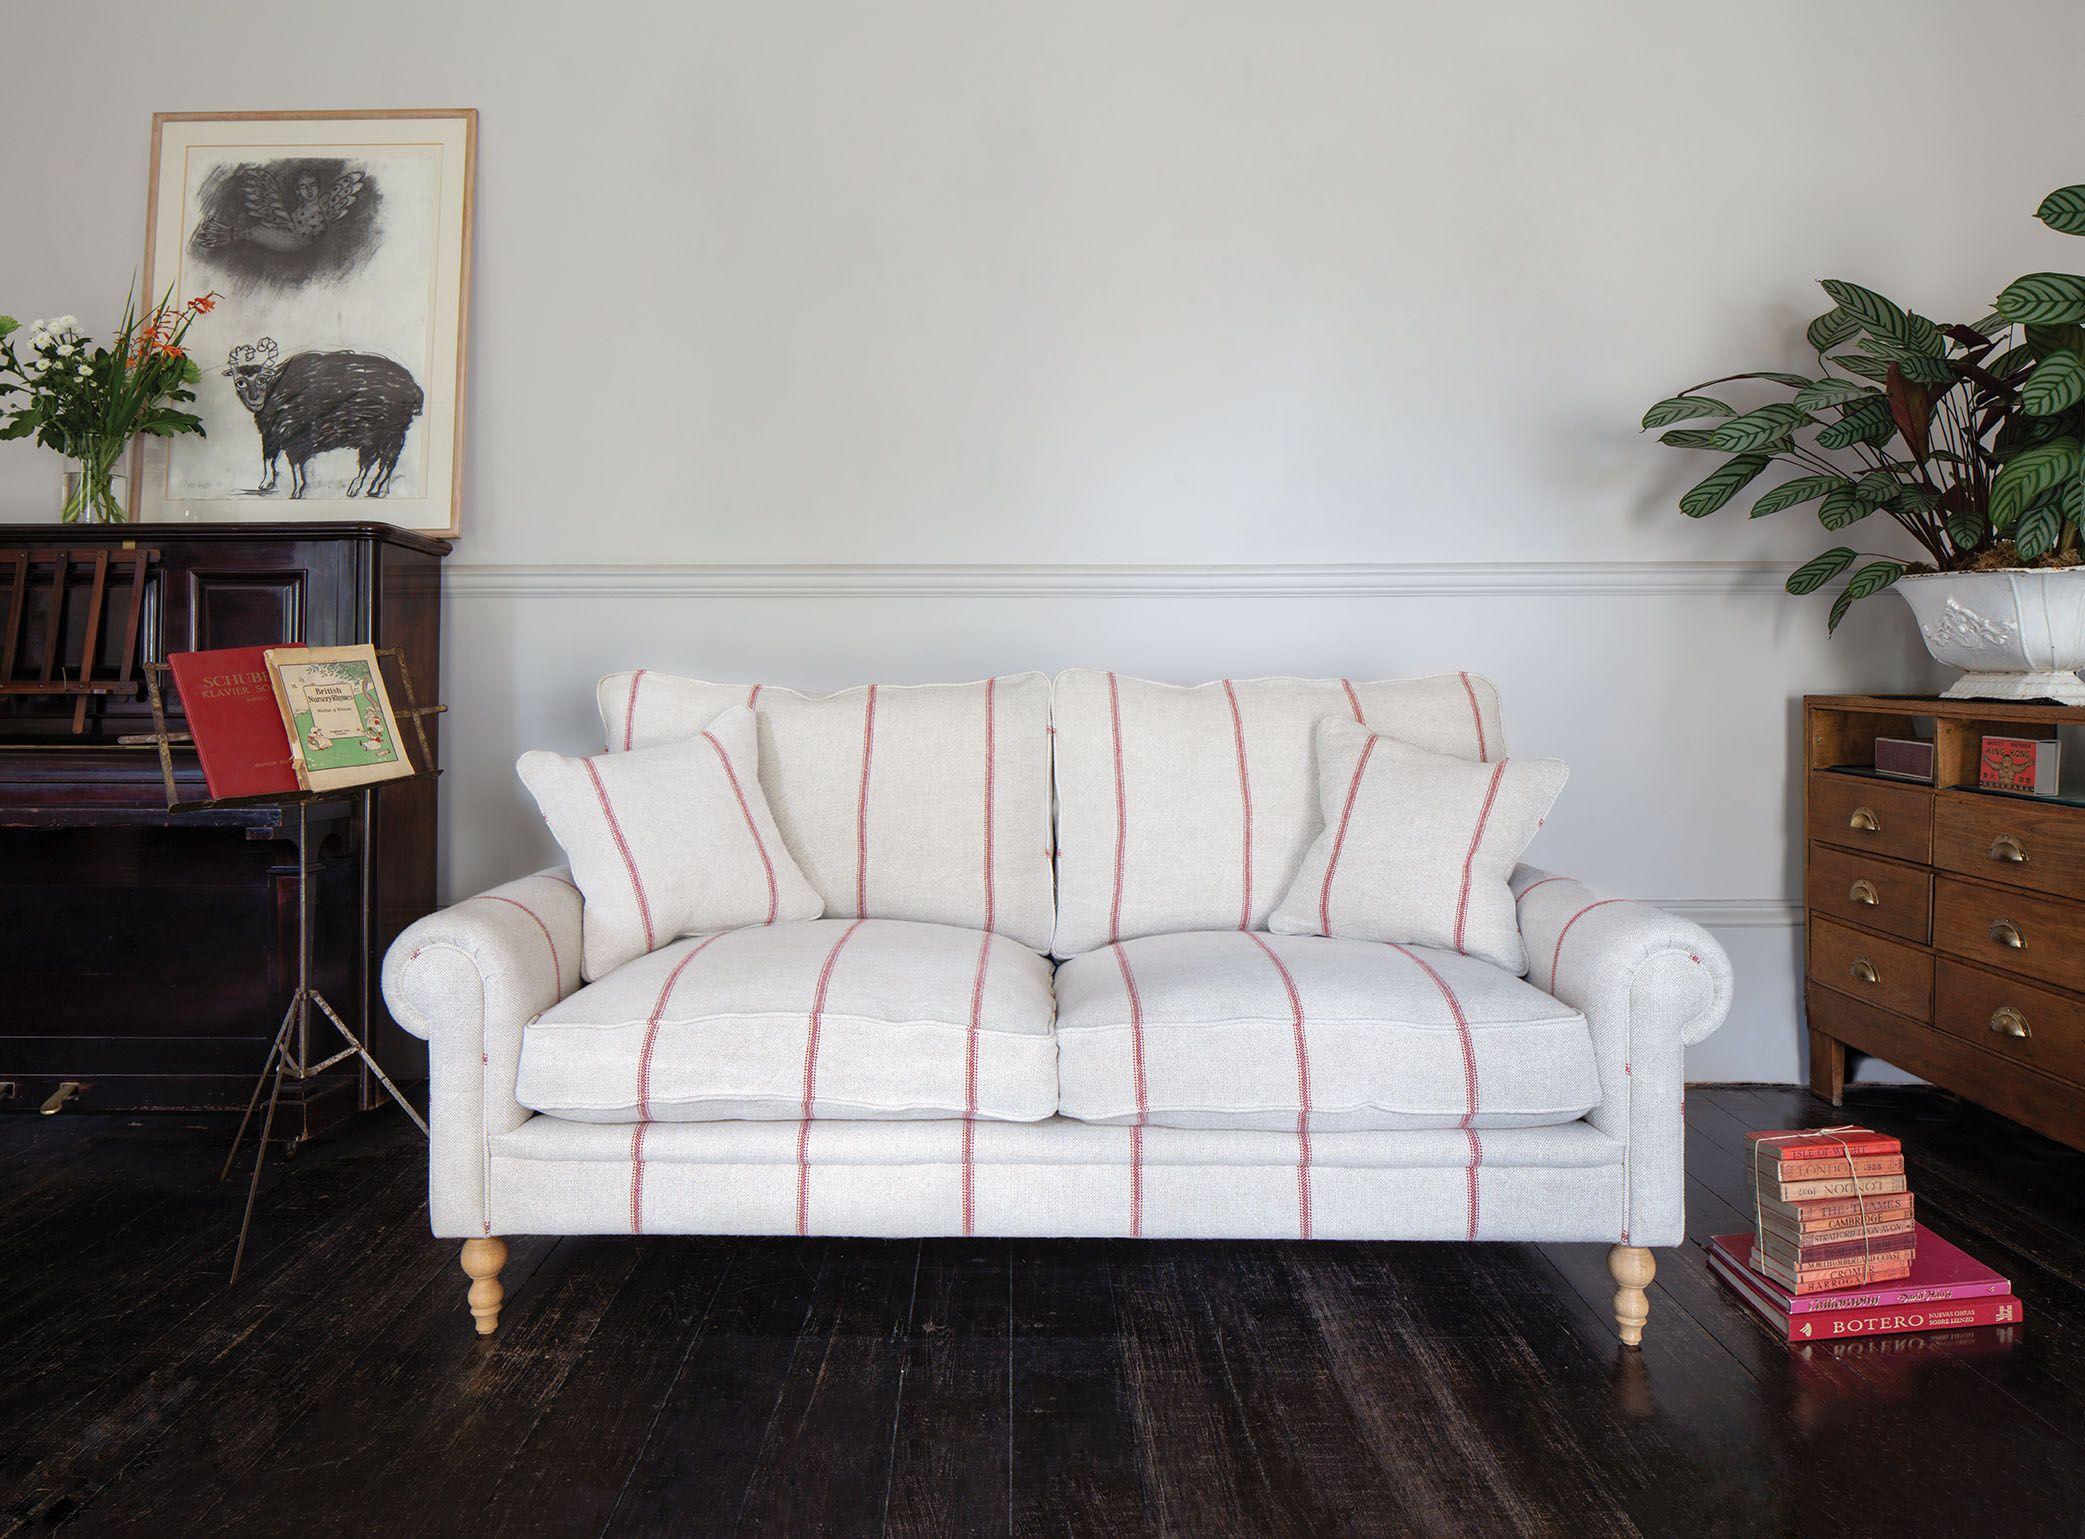 Aldingbourne 3 seater sofa in Grain Sack Red